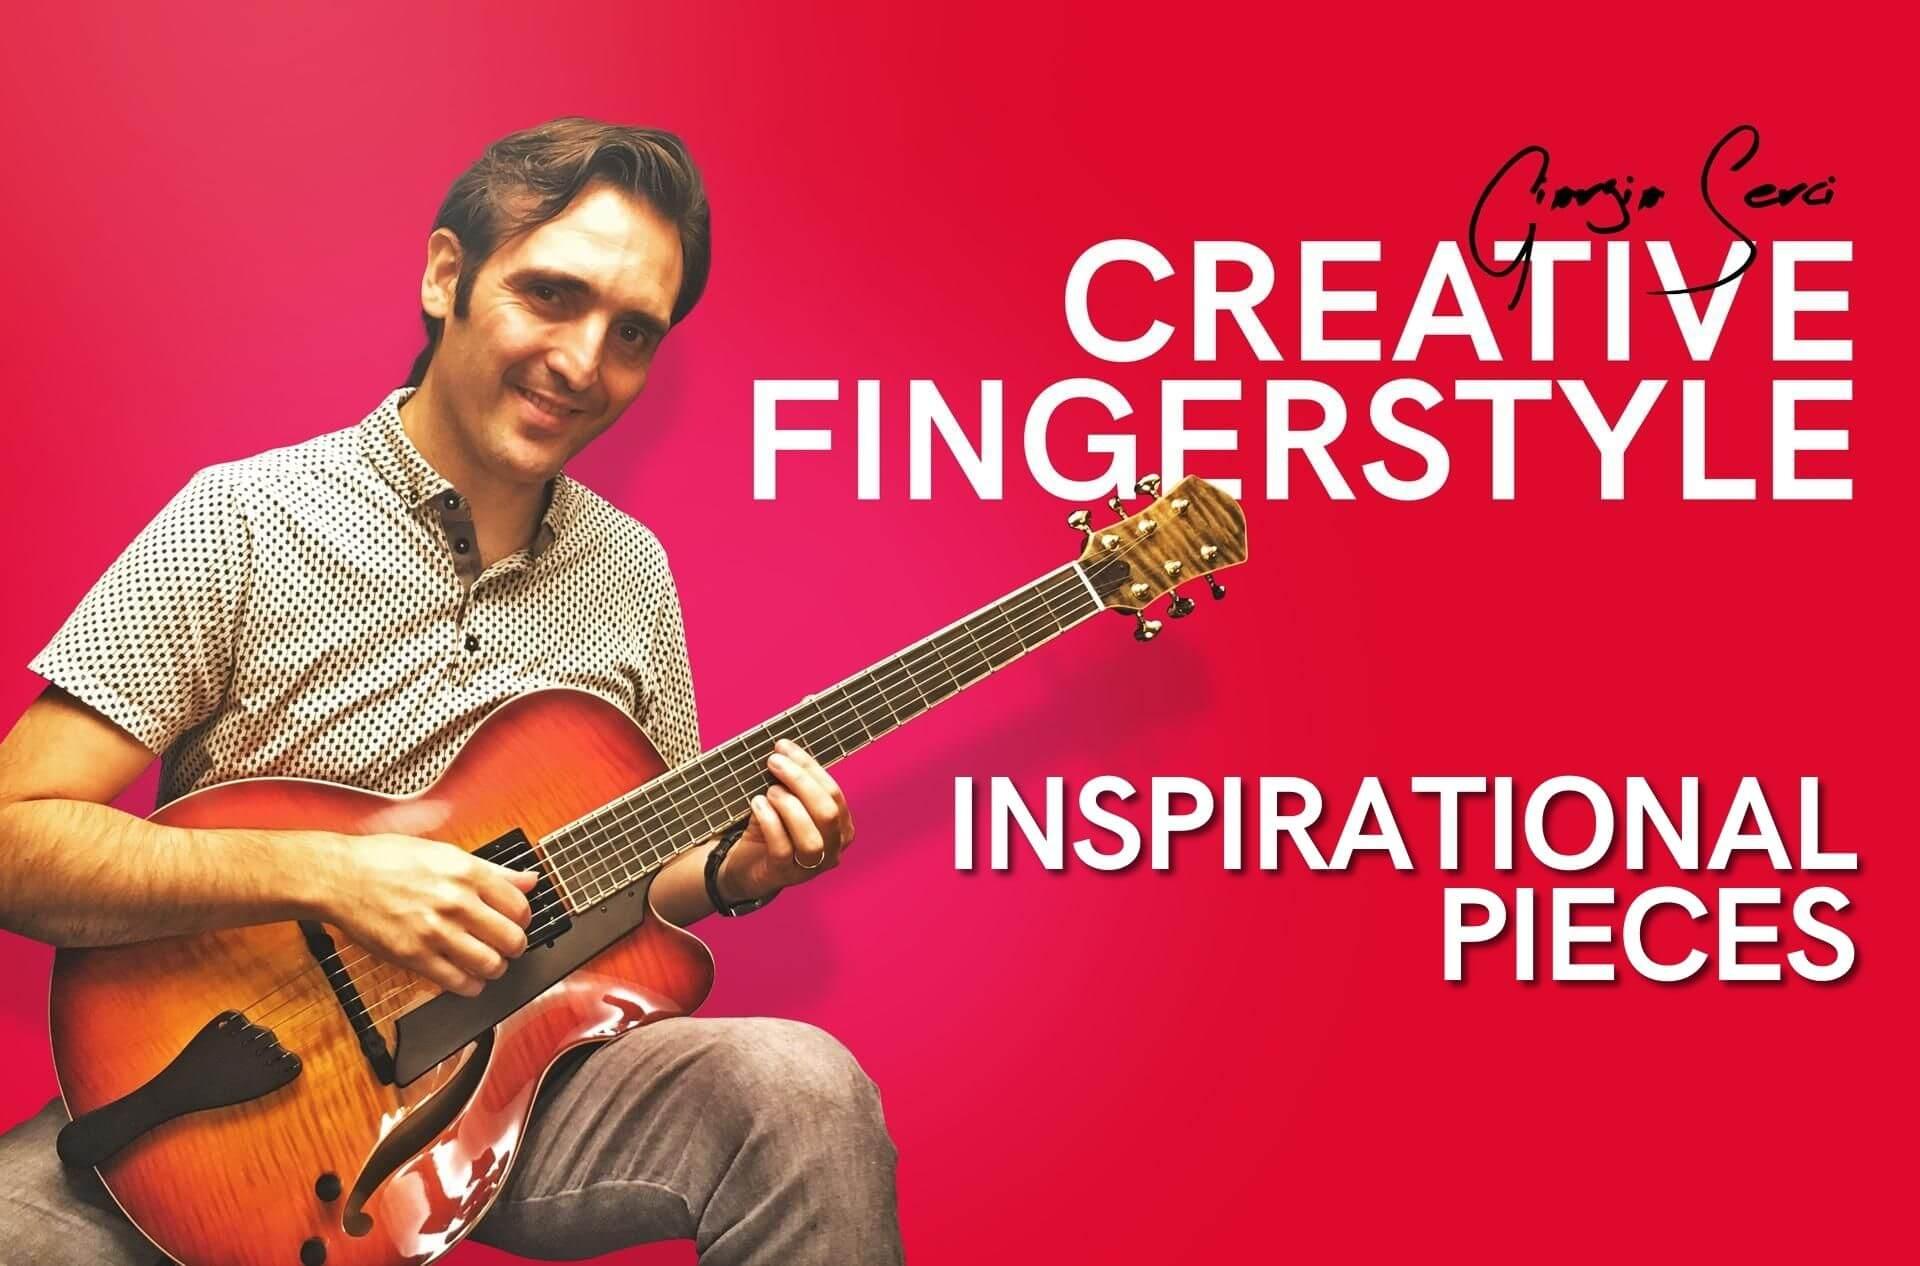 Georgio Serci - Creative Fingerstyle Inspirational Pieces